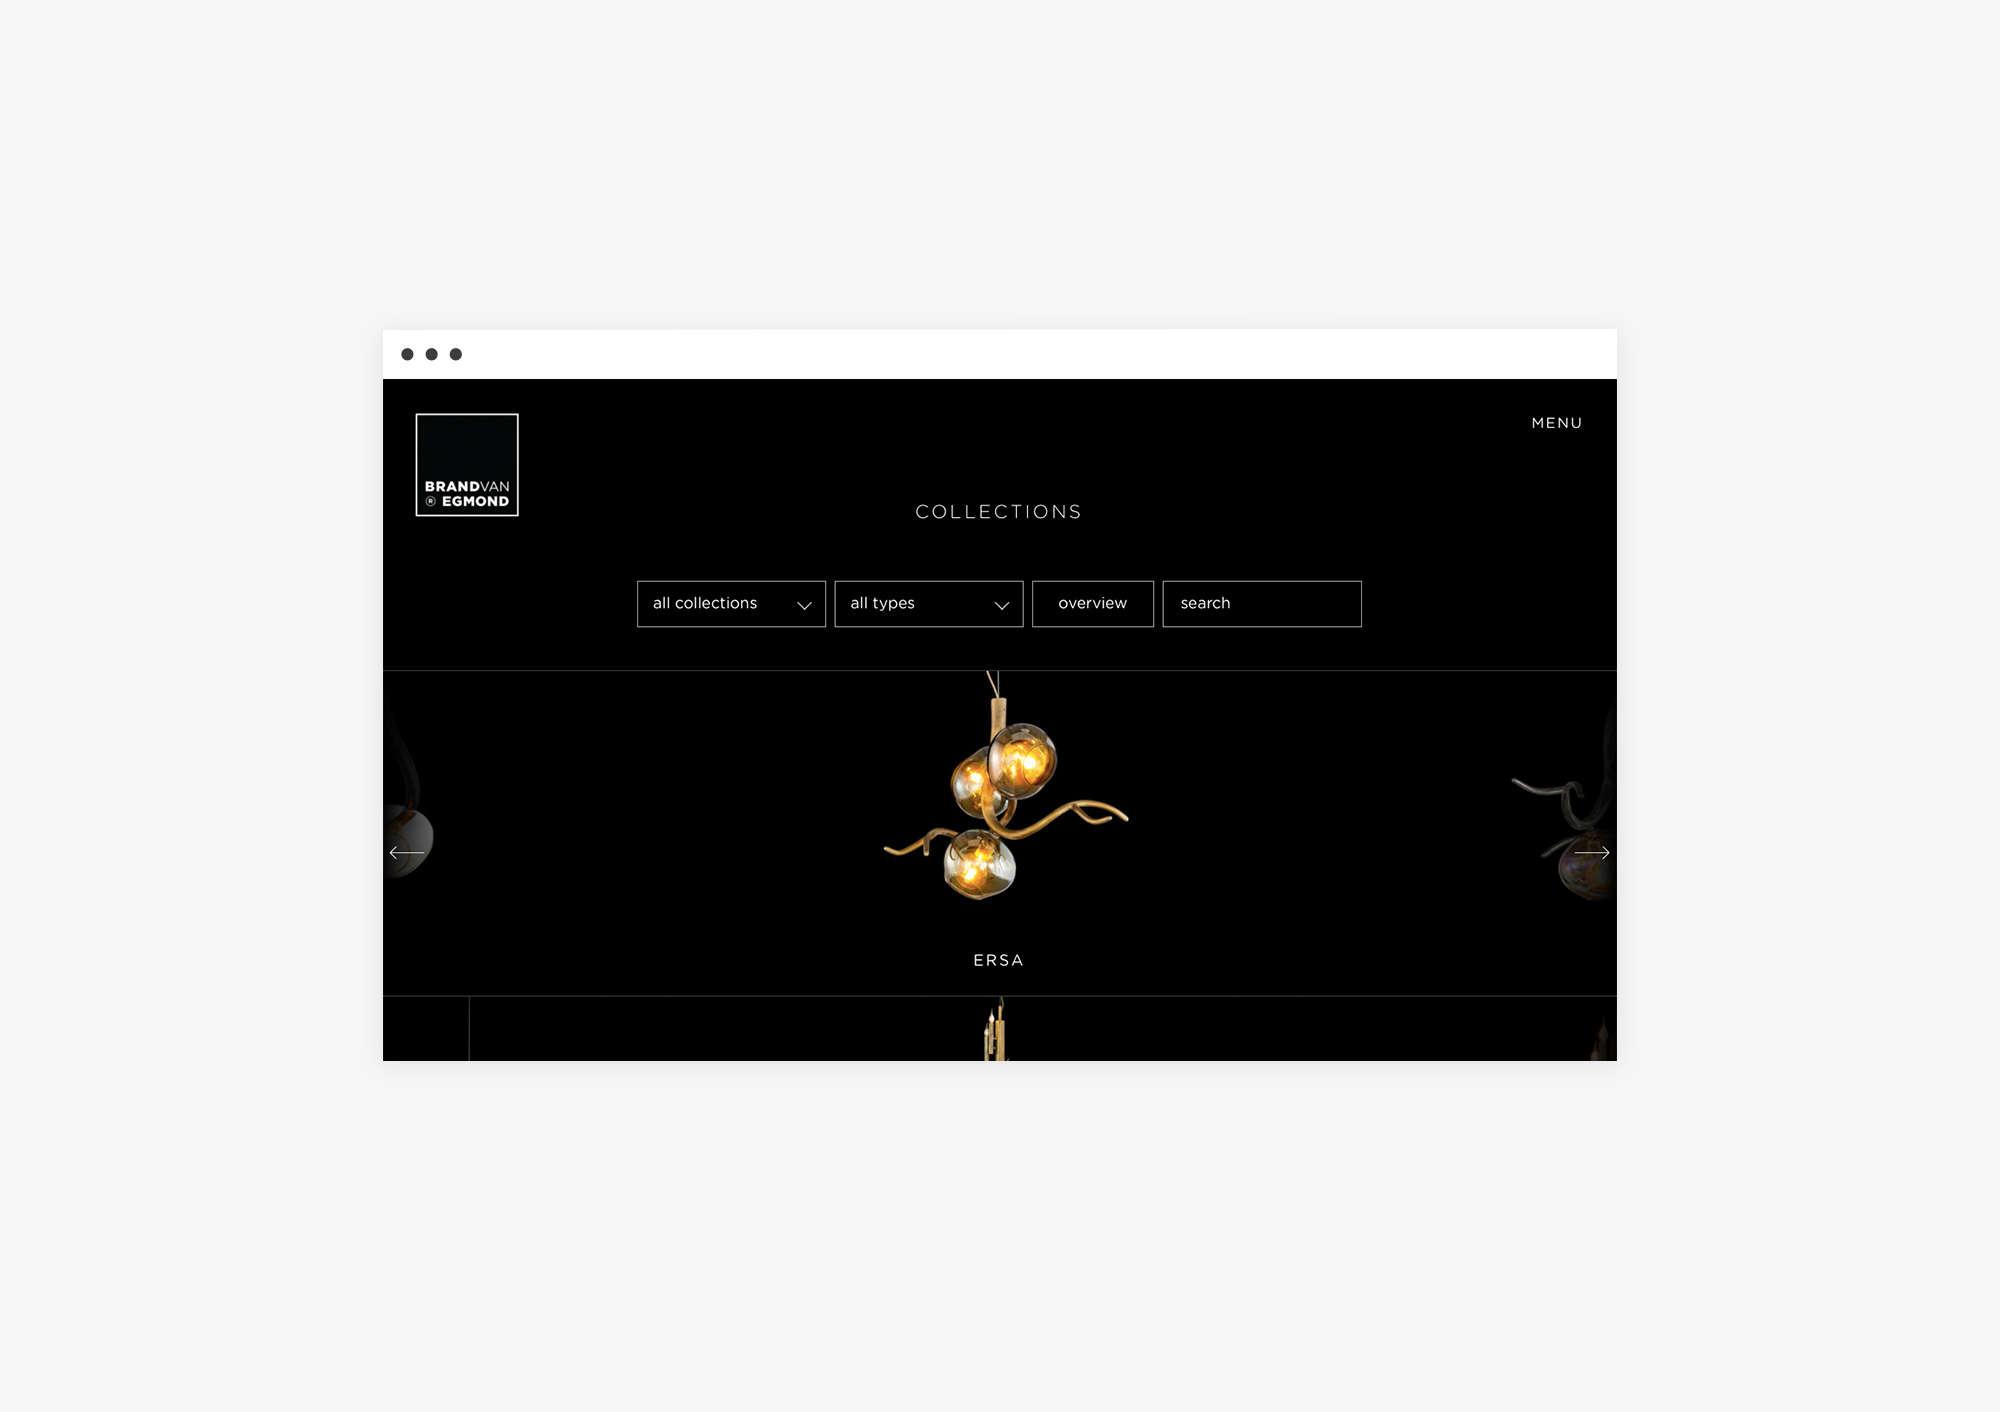 Catalogue design website for Brand van Egmond